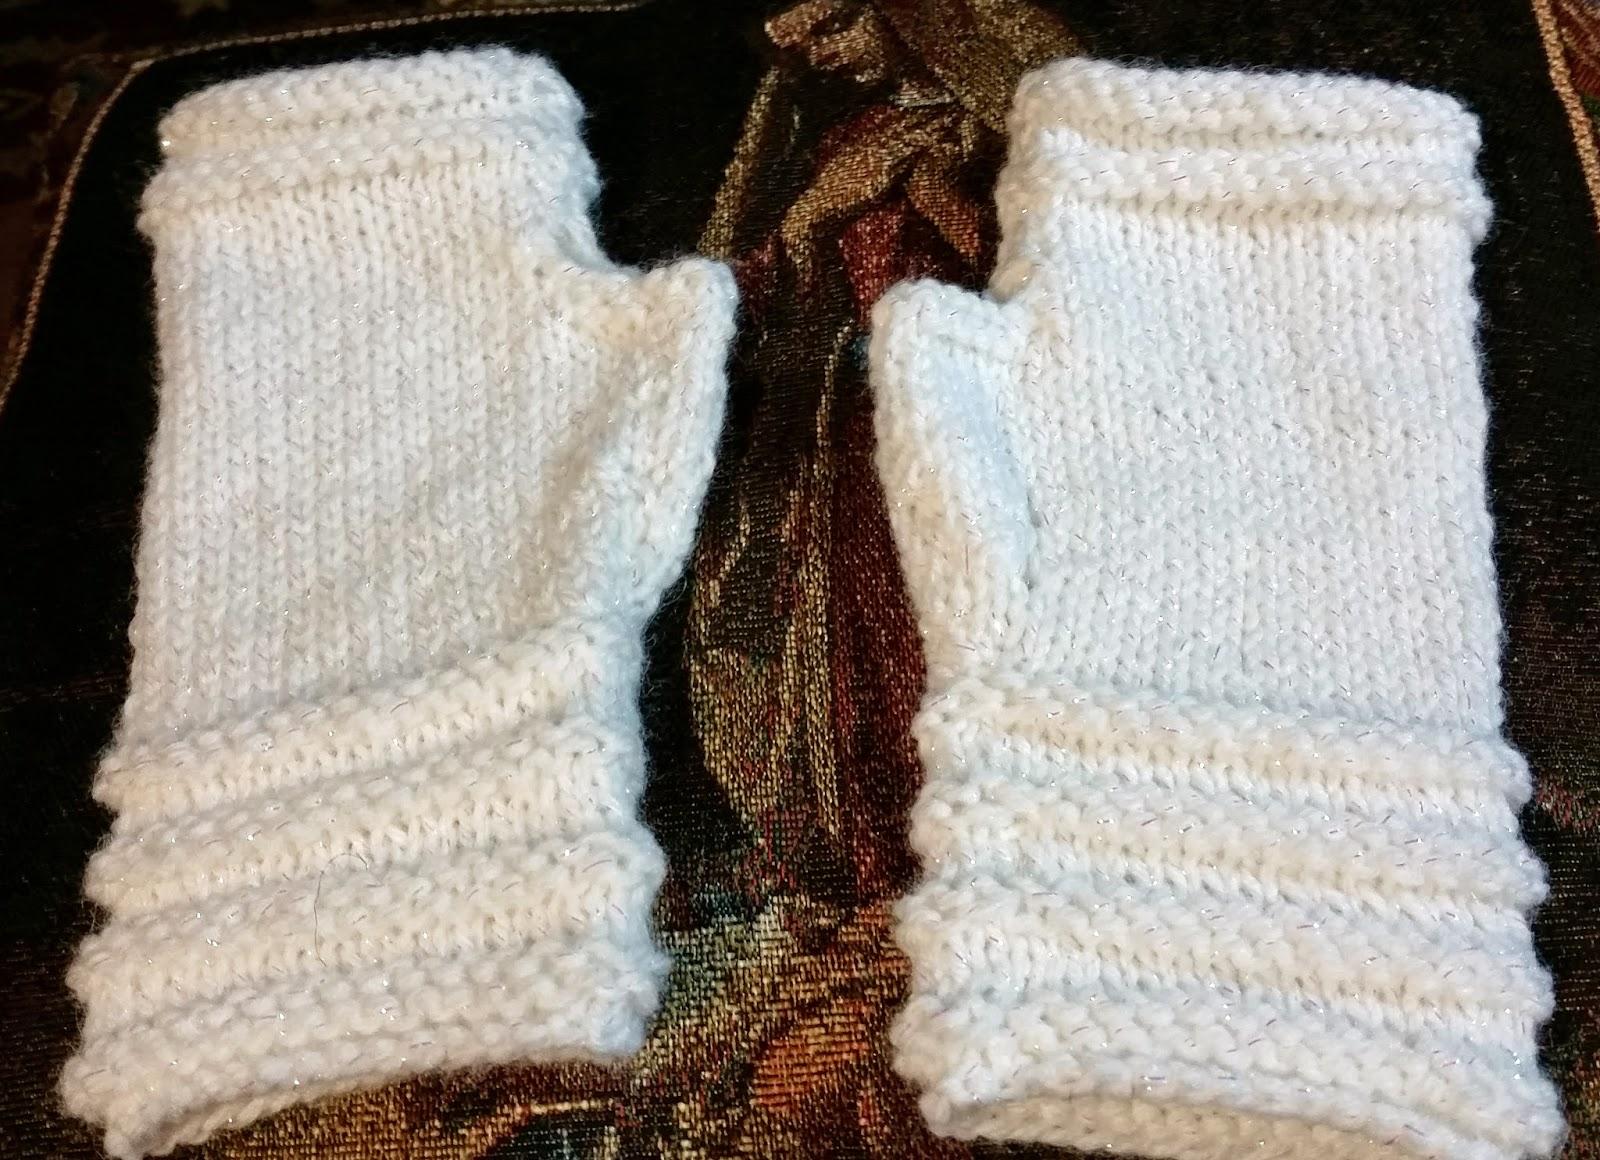 Knitting Pattern Leg Warmers Straight Needles : Spinning Memories - Knitting Love: Pattern for